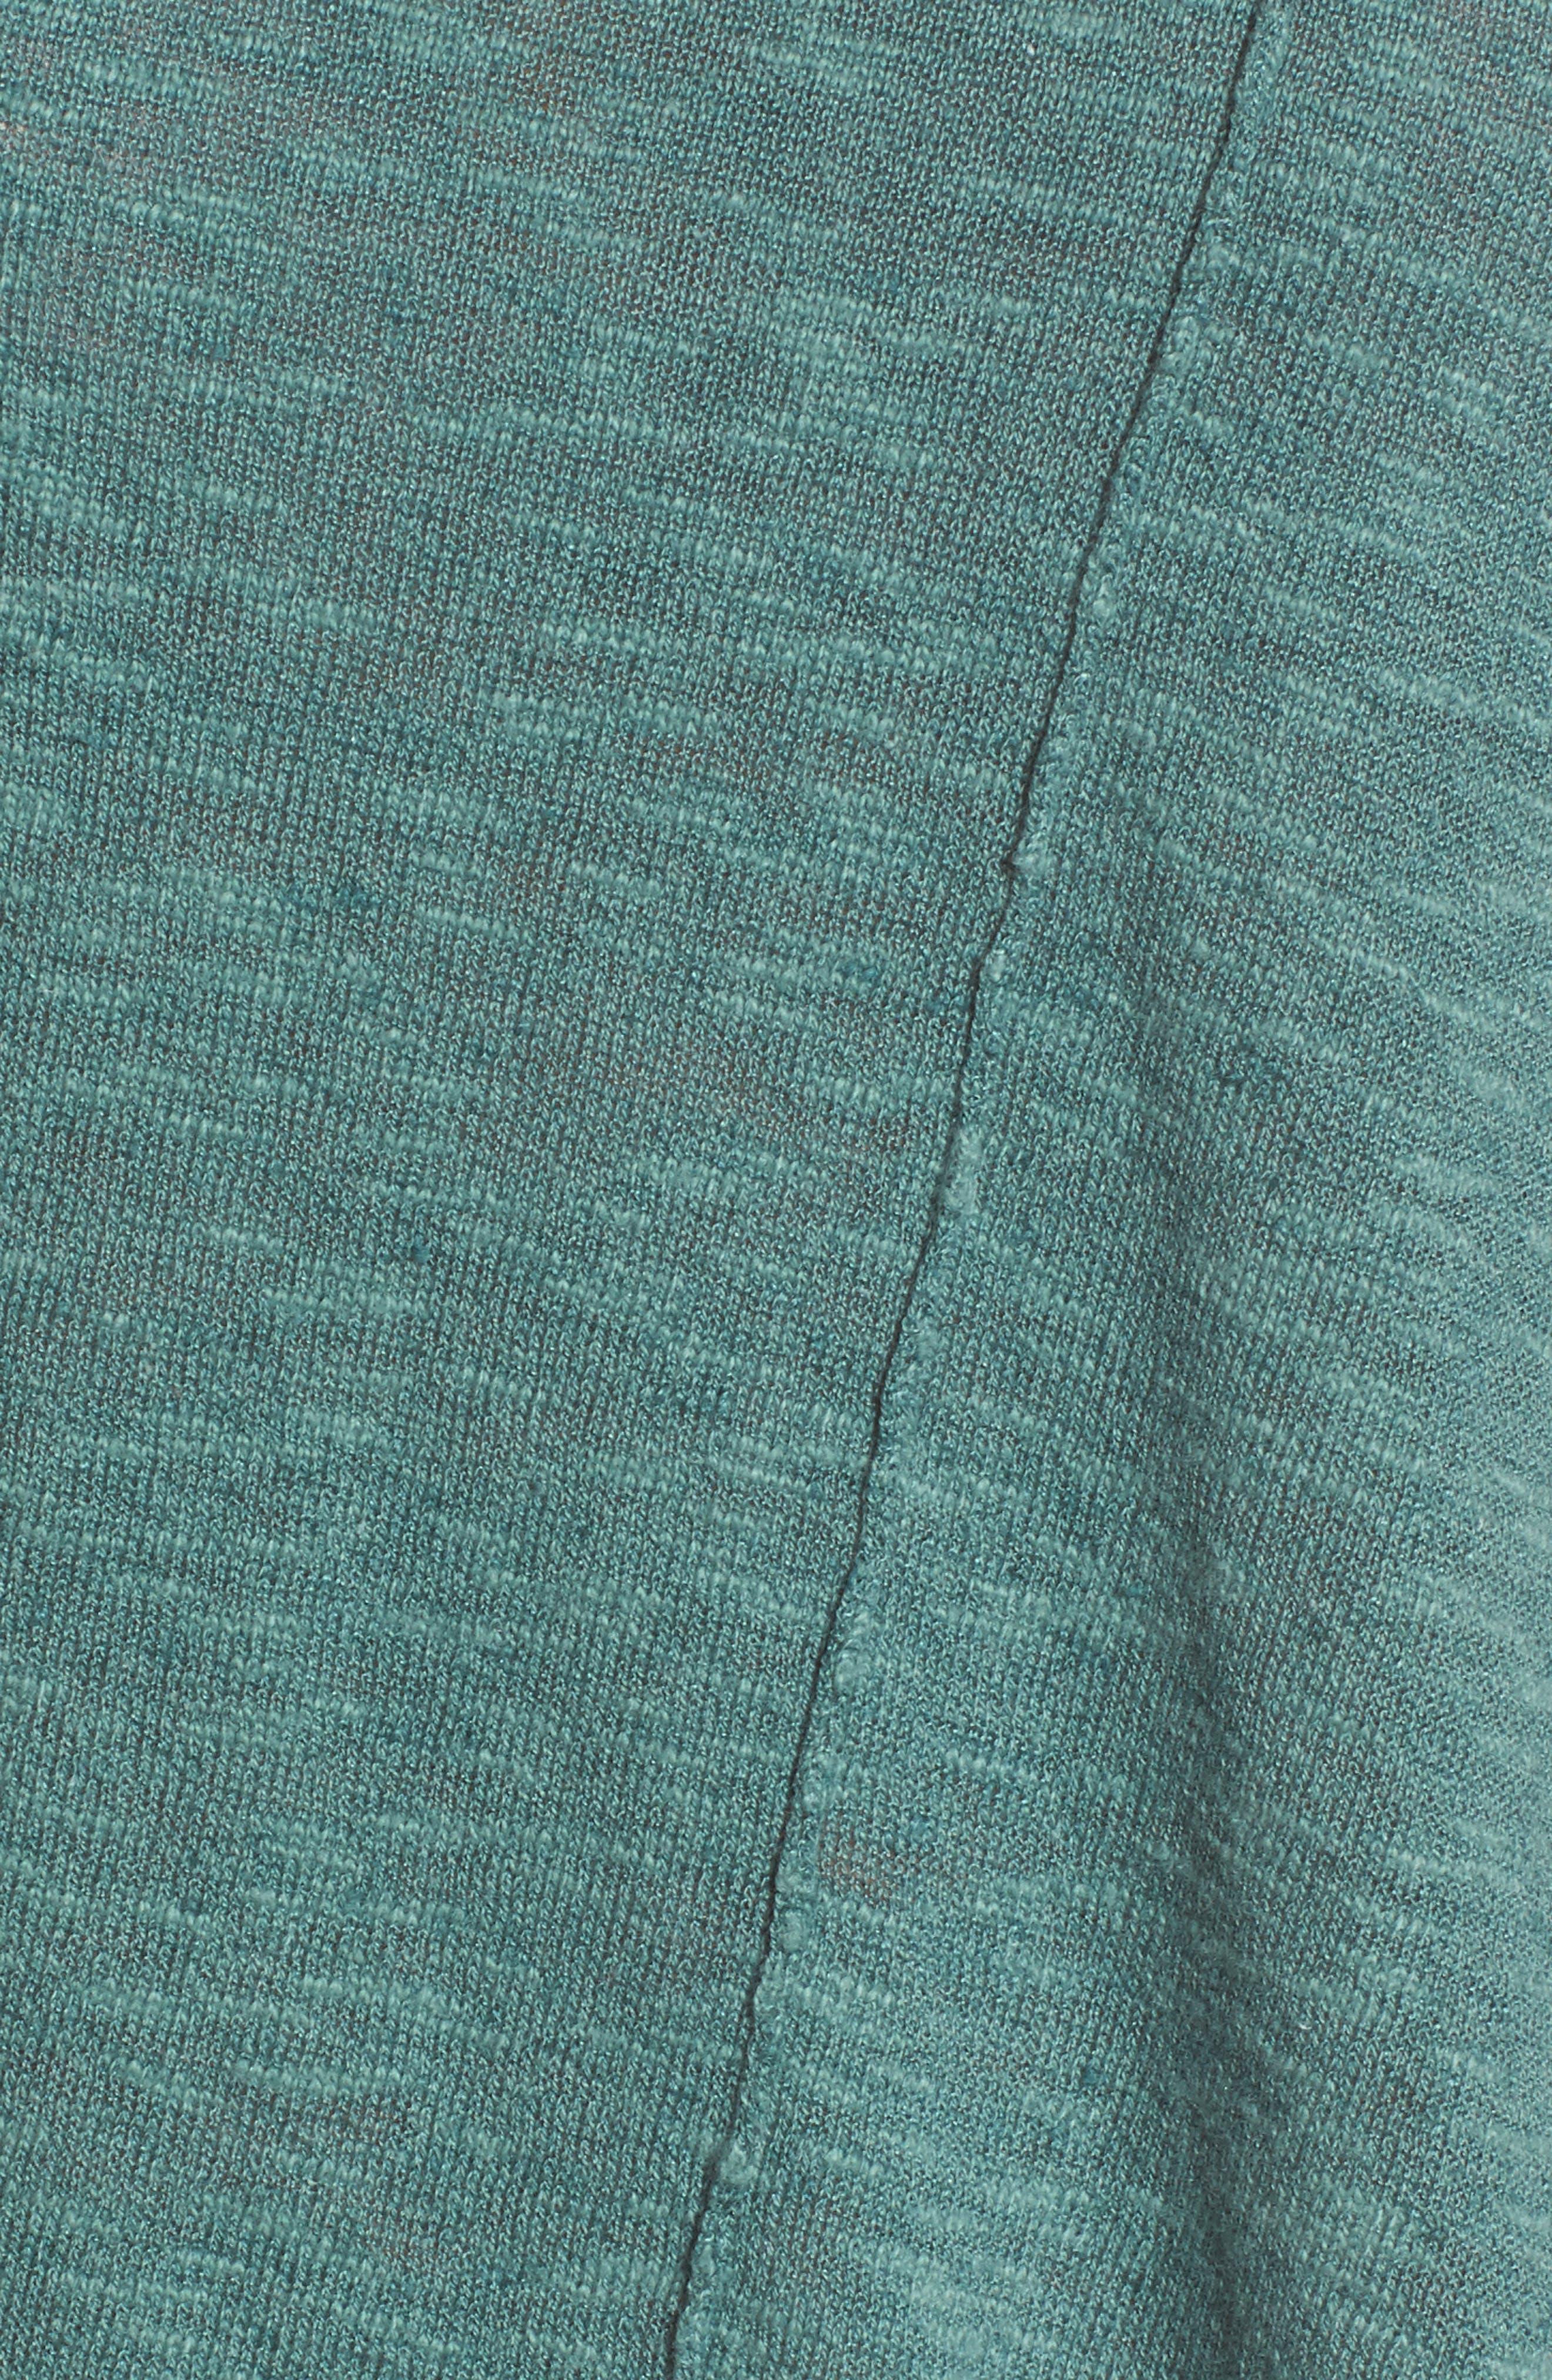 Cap Sleeve Organic Linen & Cotton Scoop Neck Top,                             Alternate thumbnail 5, color,                             Teal